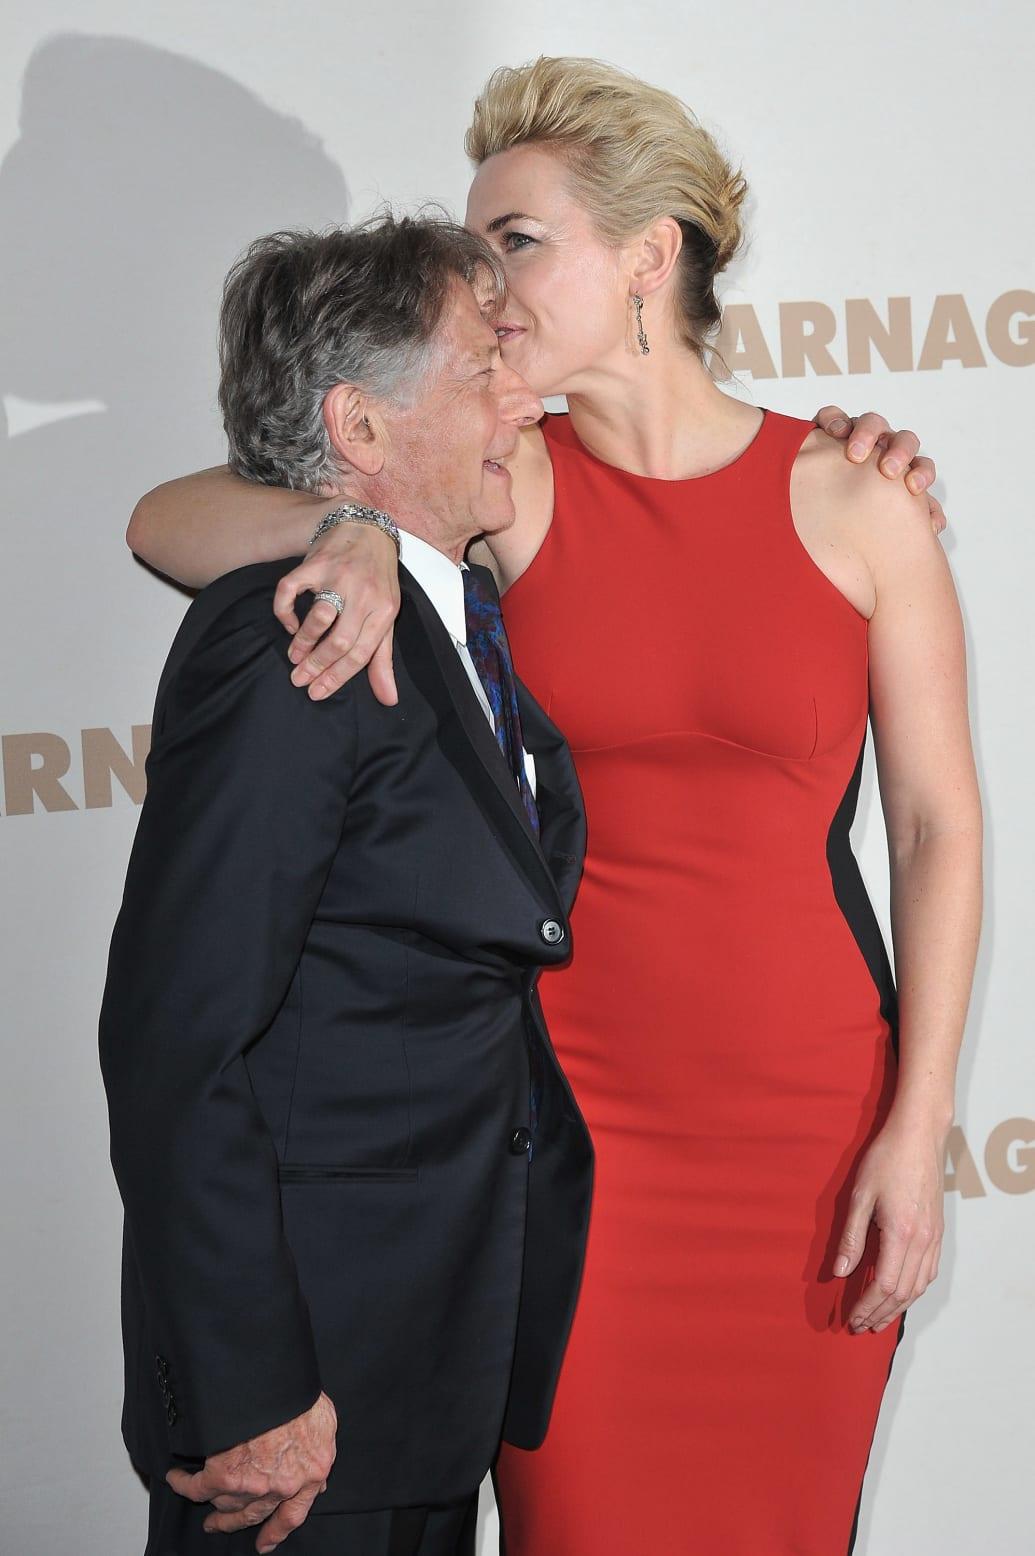 "PARIS, FRANCE - NOVEMBER 20:  Roman Polanski and Kate Winslet (R) attend ""Carnage"" Paris premiere at Cinema Gaumont Marignan on November 20, 2011 in Paris, France.  (Photo by Pascal Le Segretain/Getty Images)"